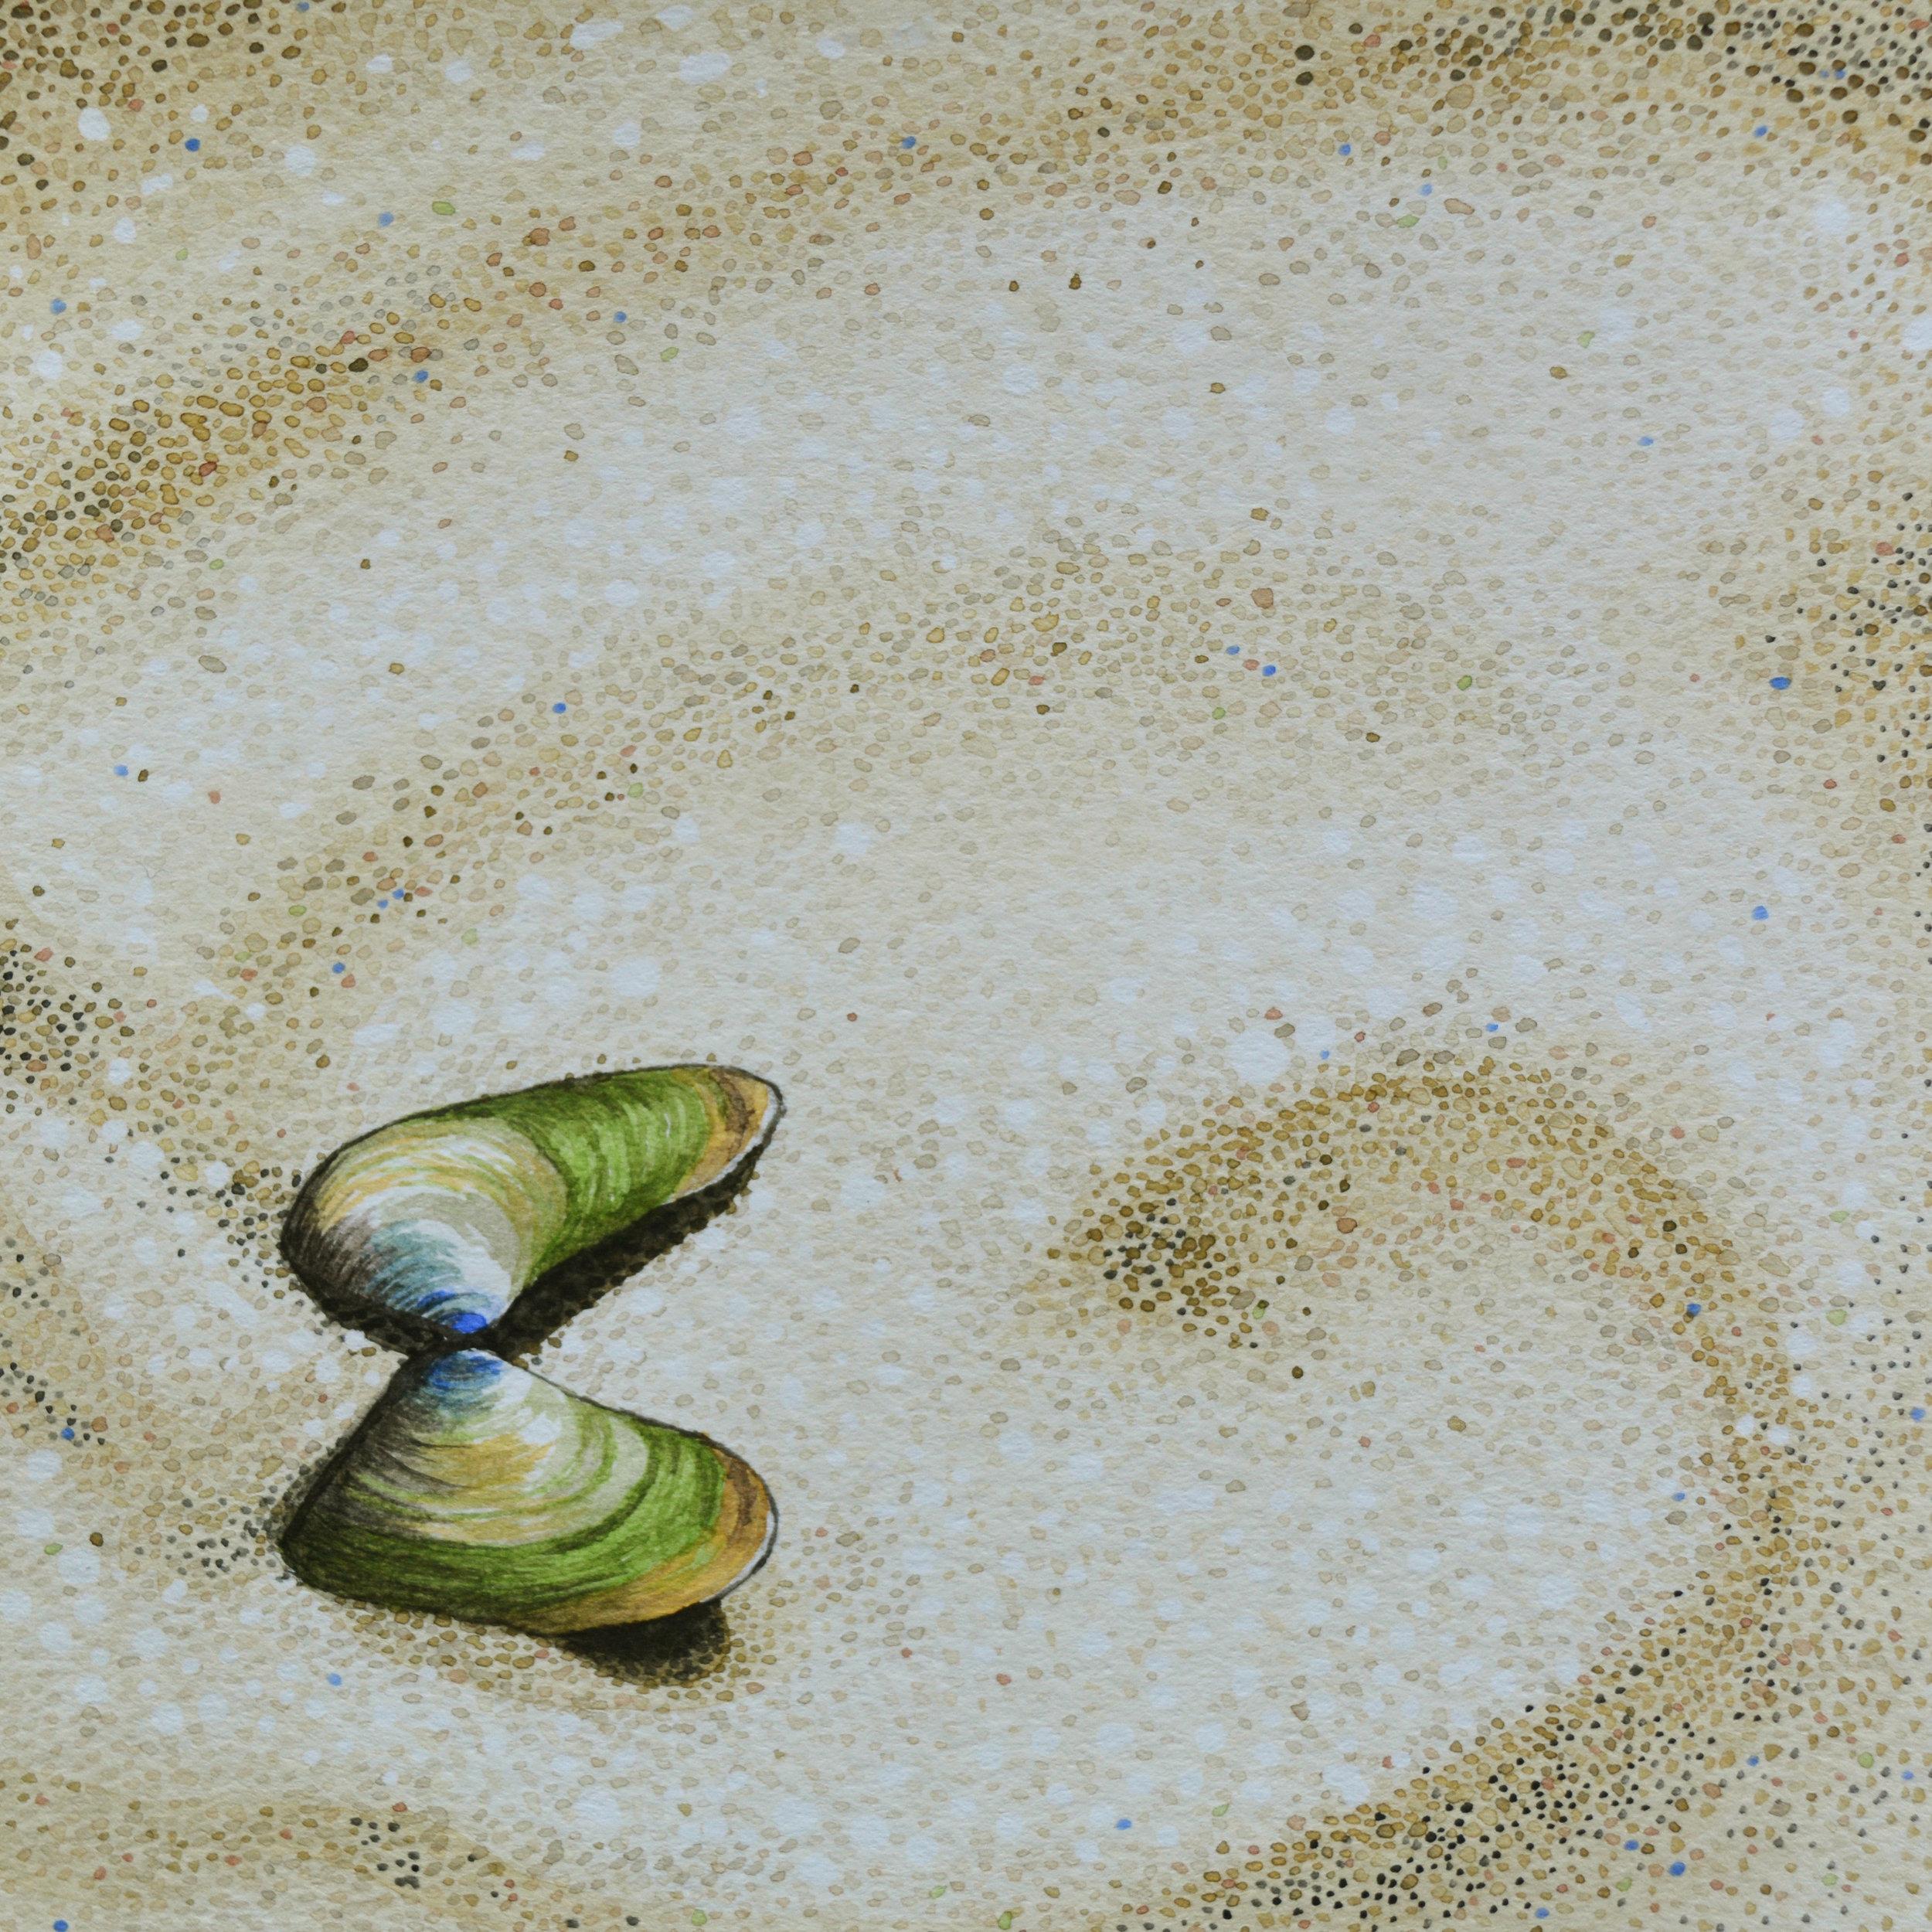 Gulf Islands National Seashore, Pensacola, Florida: 3/19/17, 13:05:29